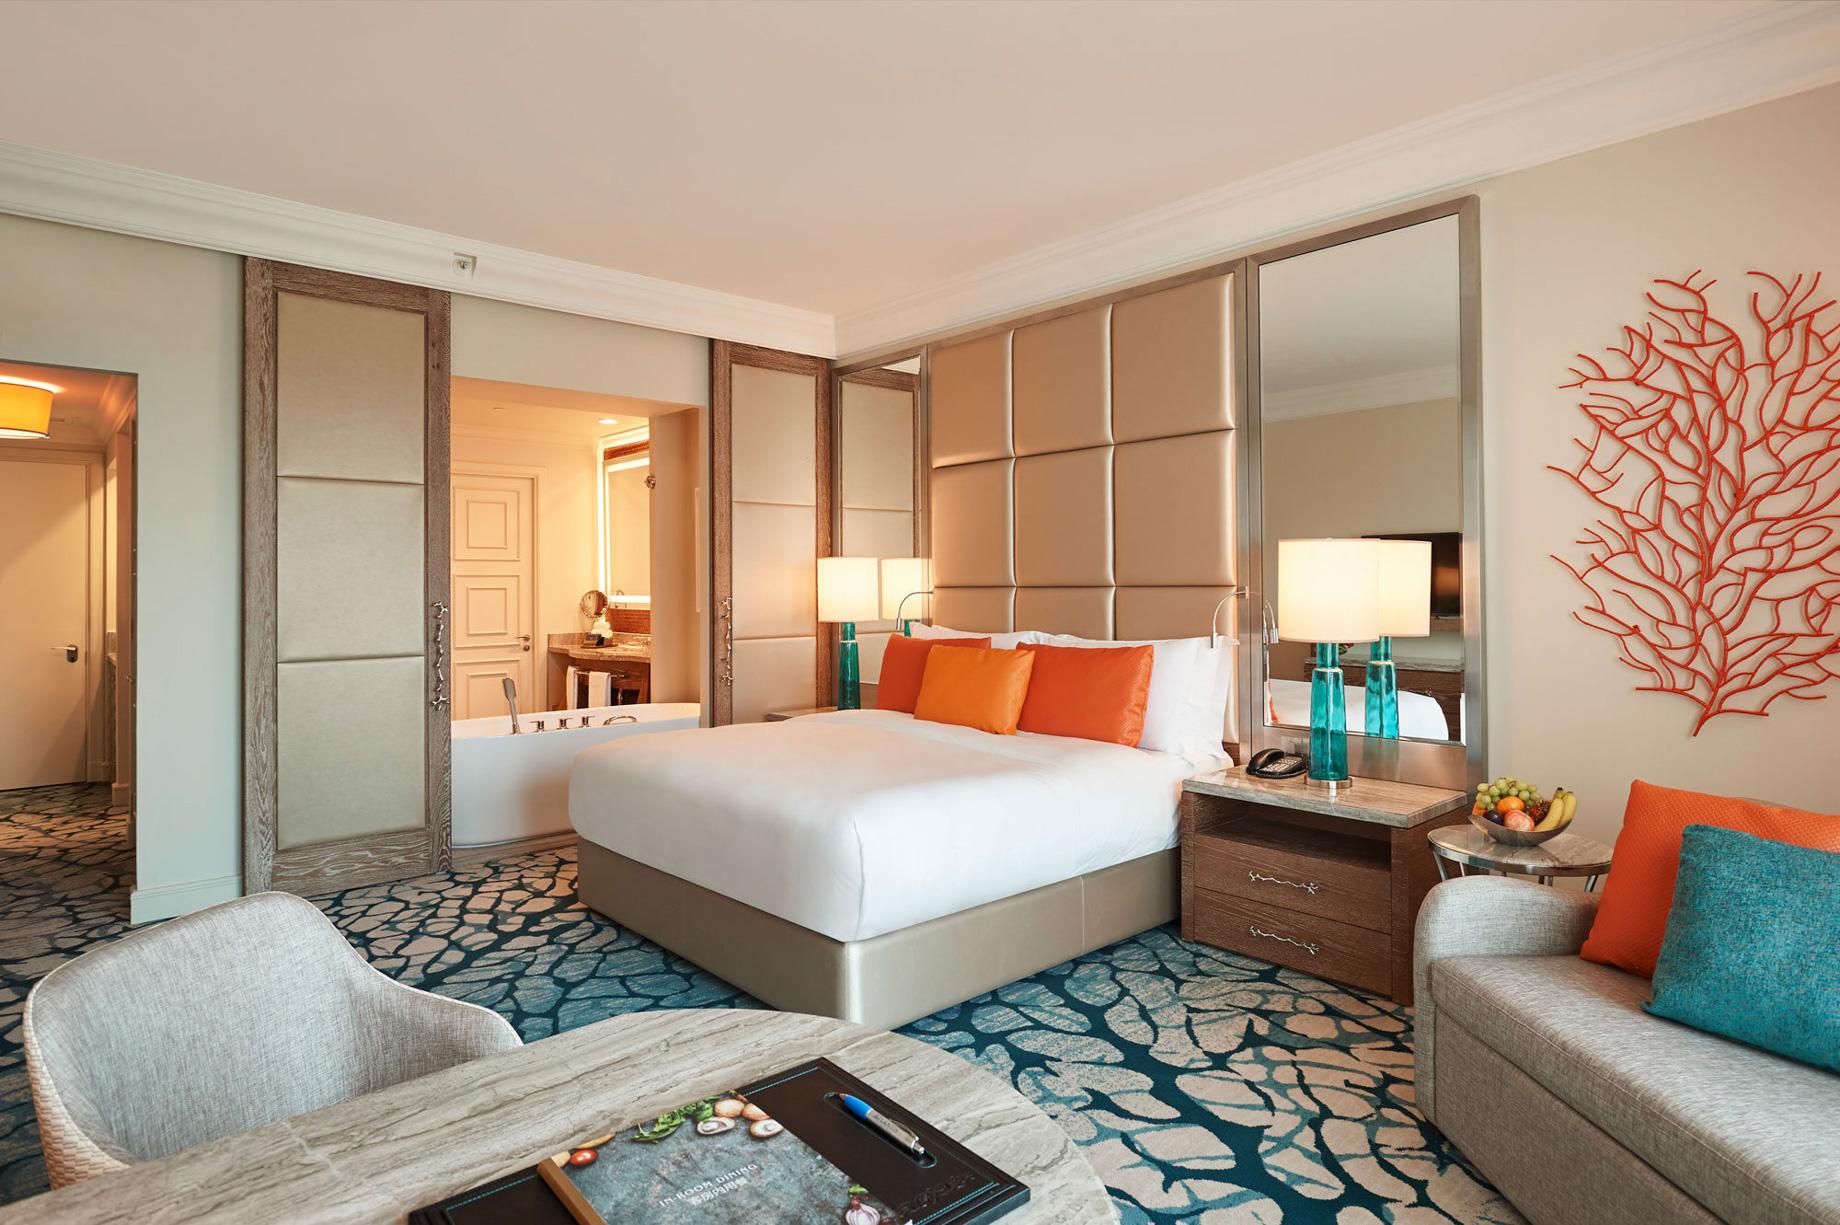 Atlantis The Palm Luxury Resort – Crescent Rd, Dubai, UAE – Ocean View Bedroom